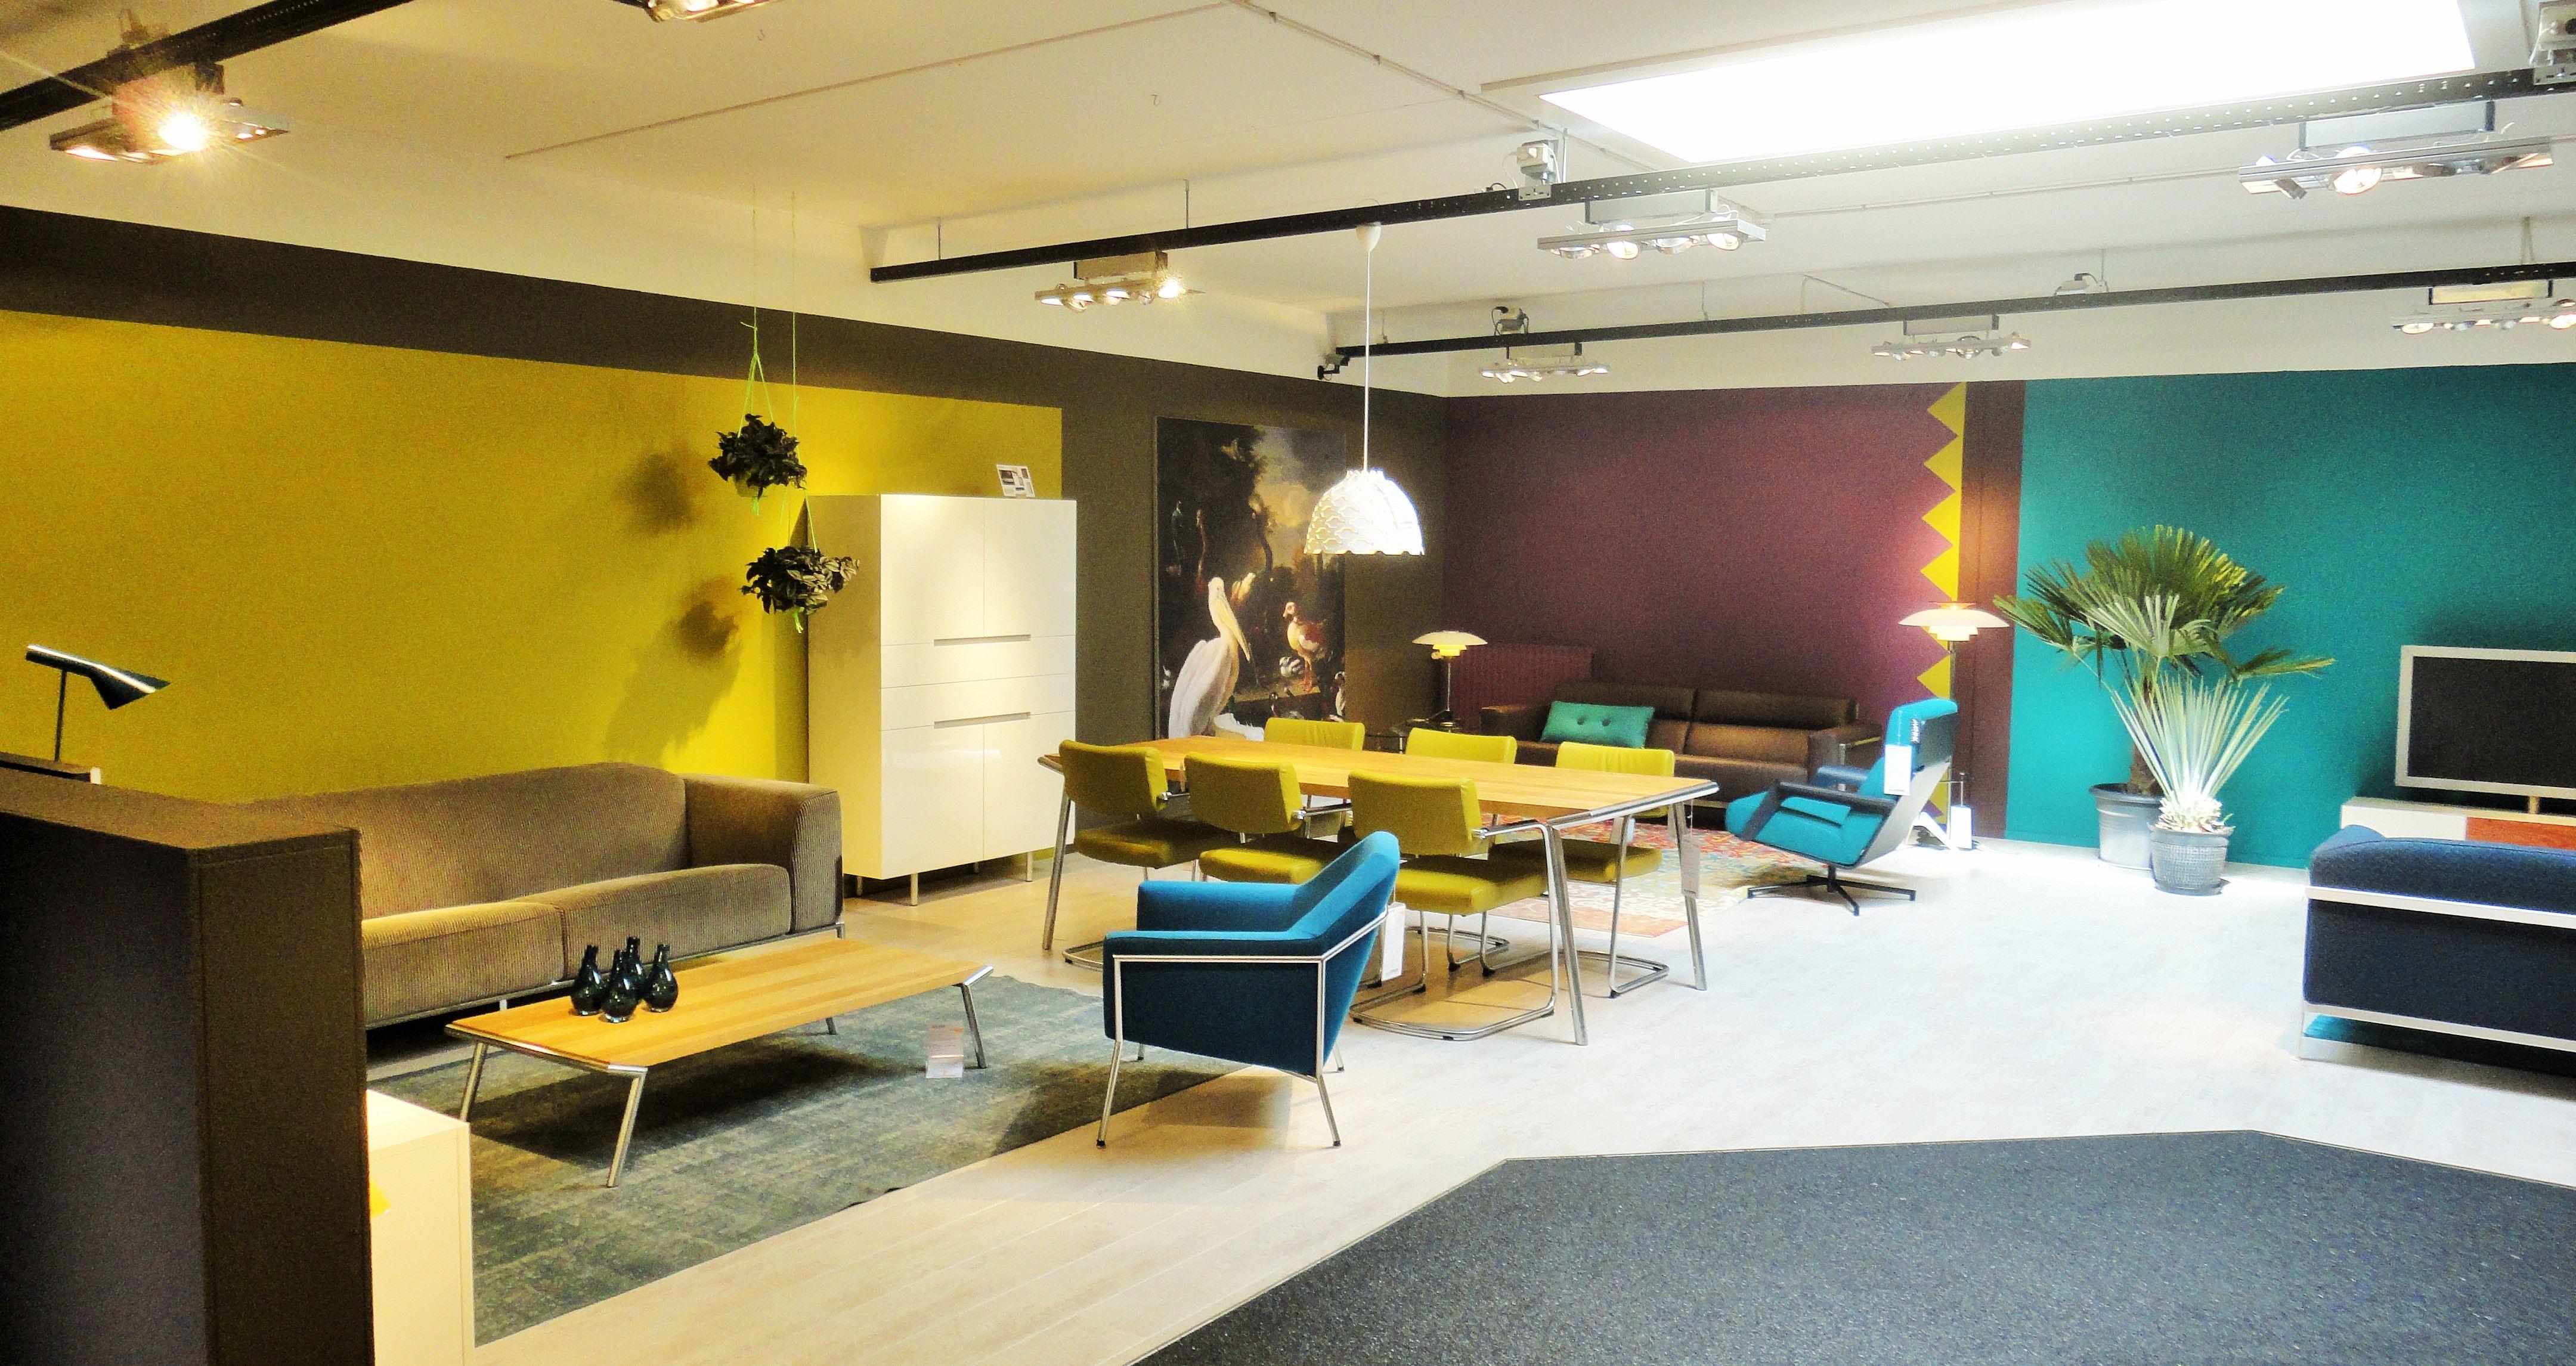 Van Til Alkmaar.Harvink Studio Van Til Interieur Alkmaar Harvink Pinterest